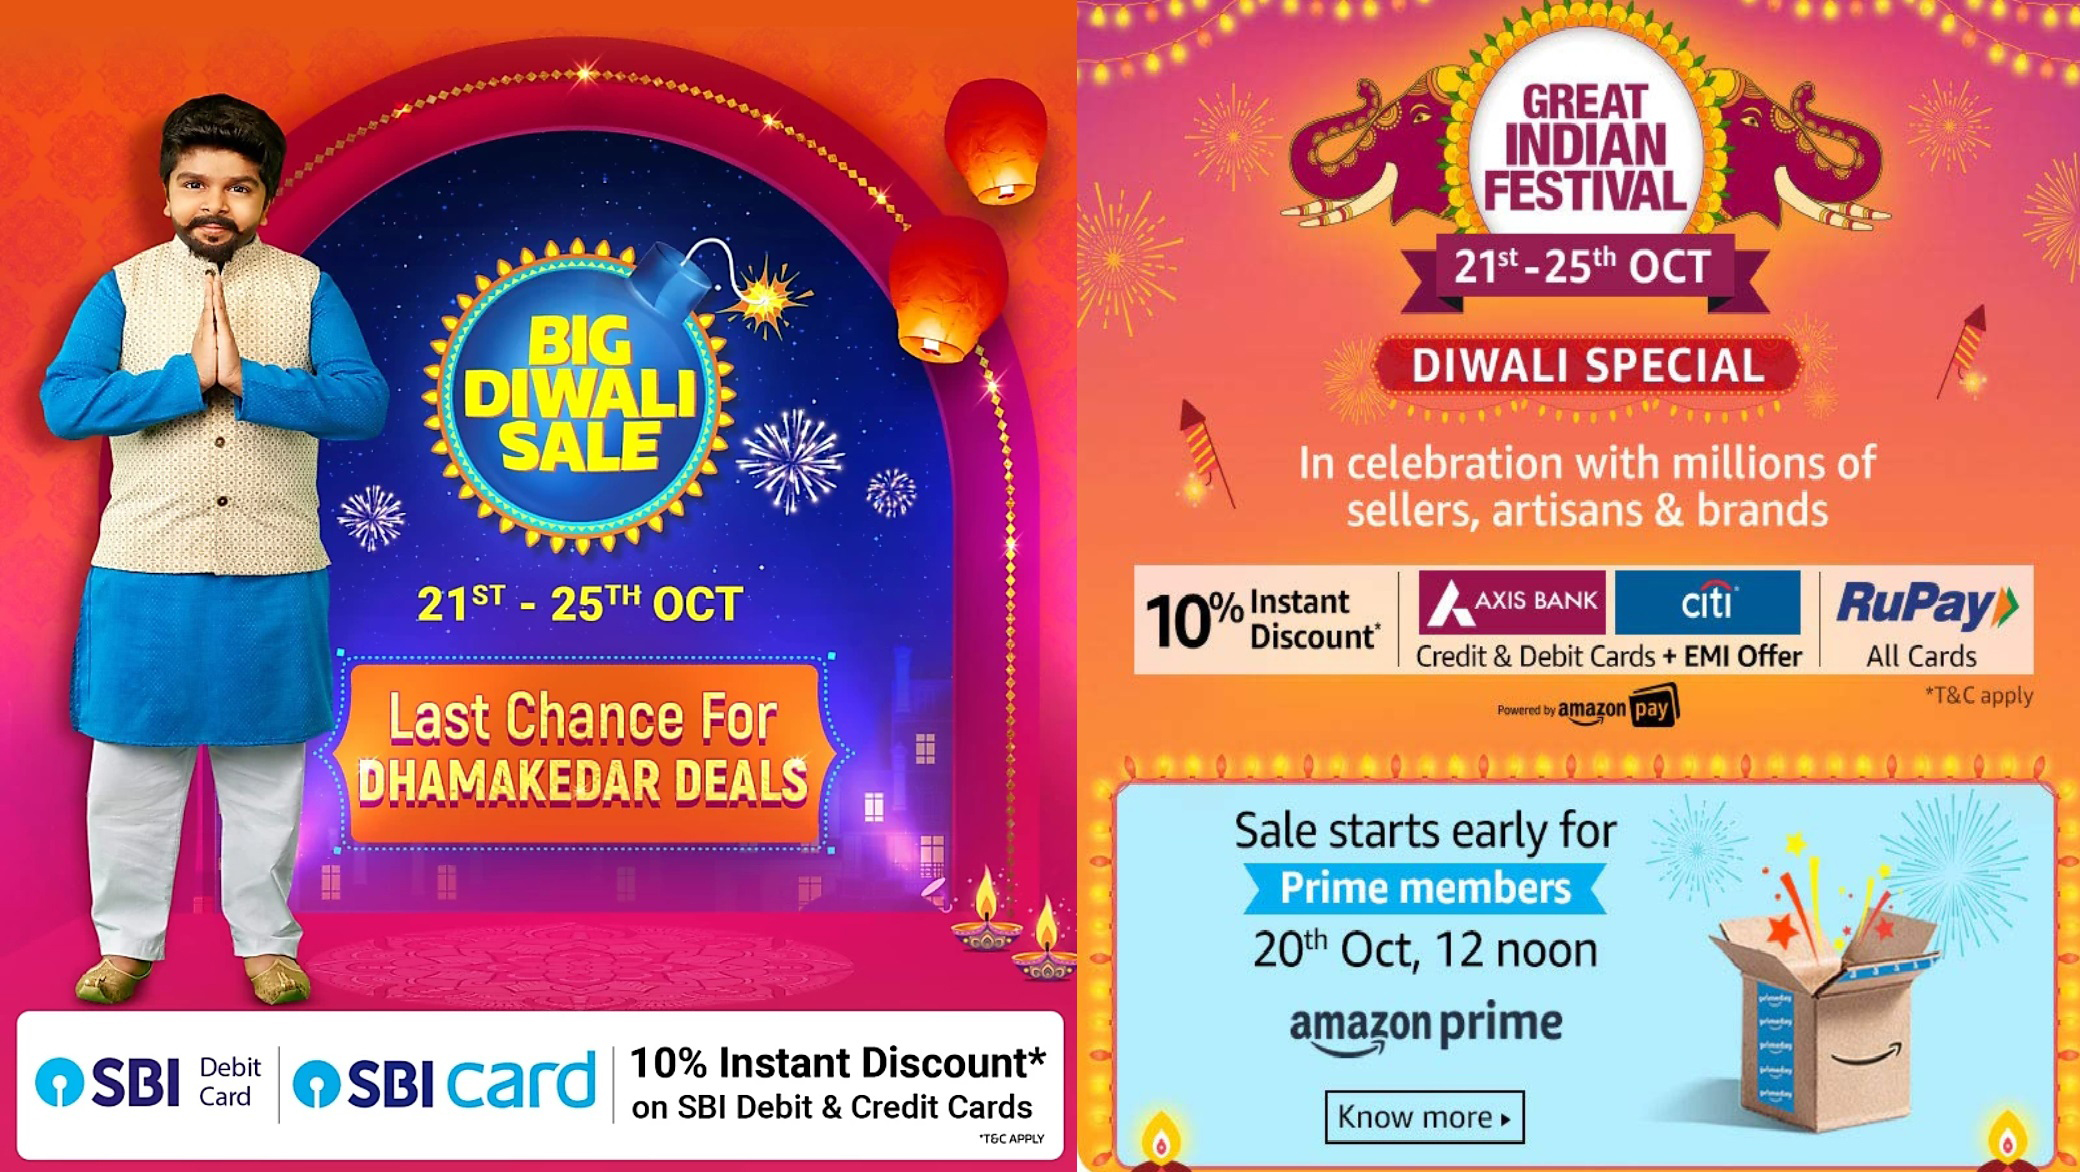 Flipkart Diwali Sale 21st – 25th OCT 2019